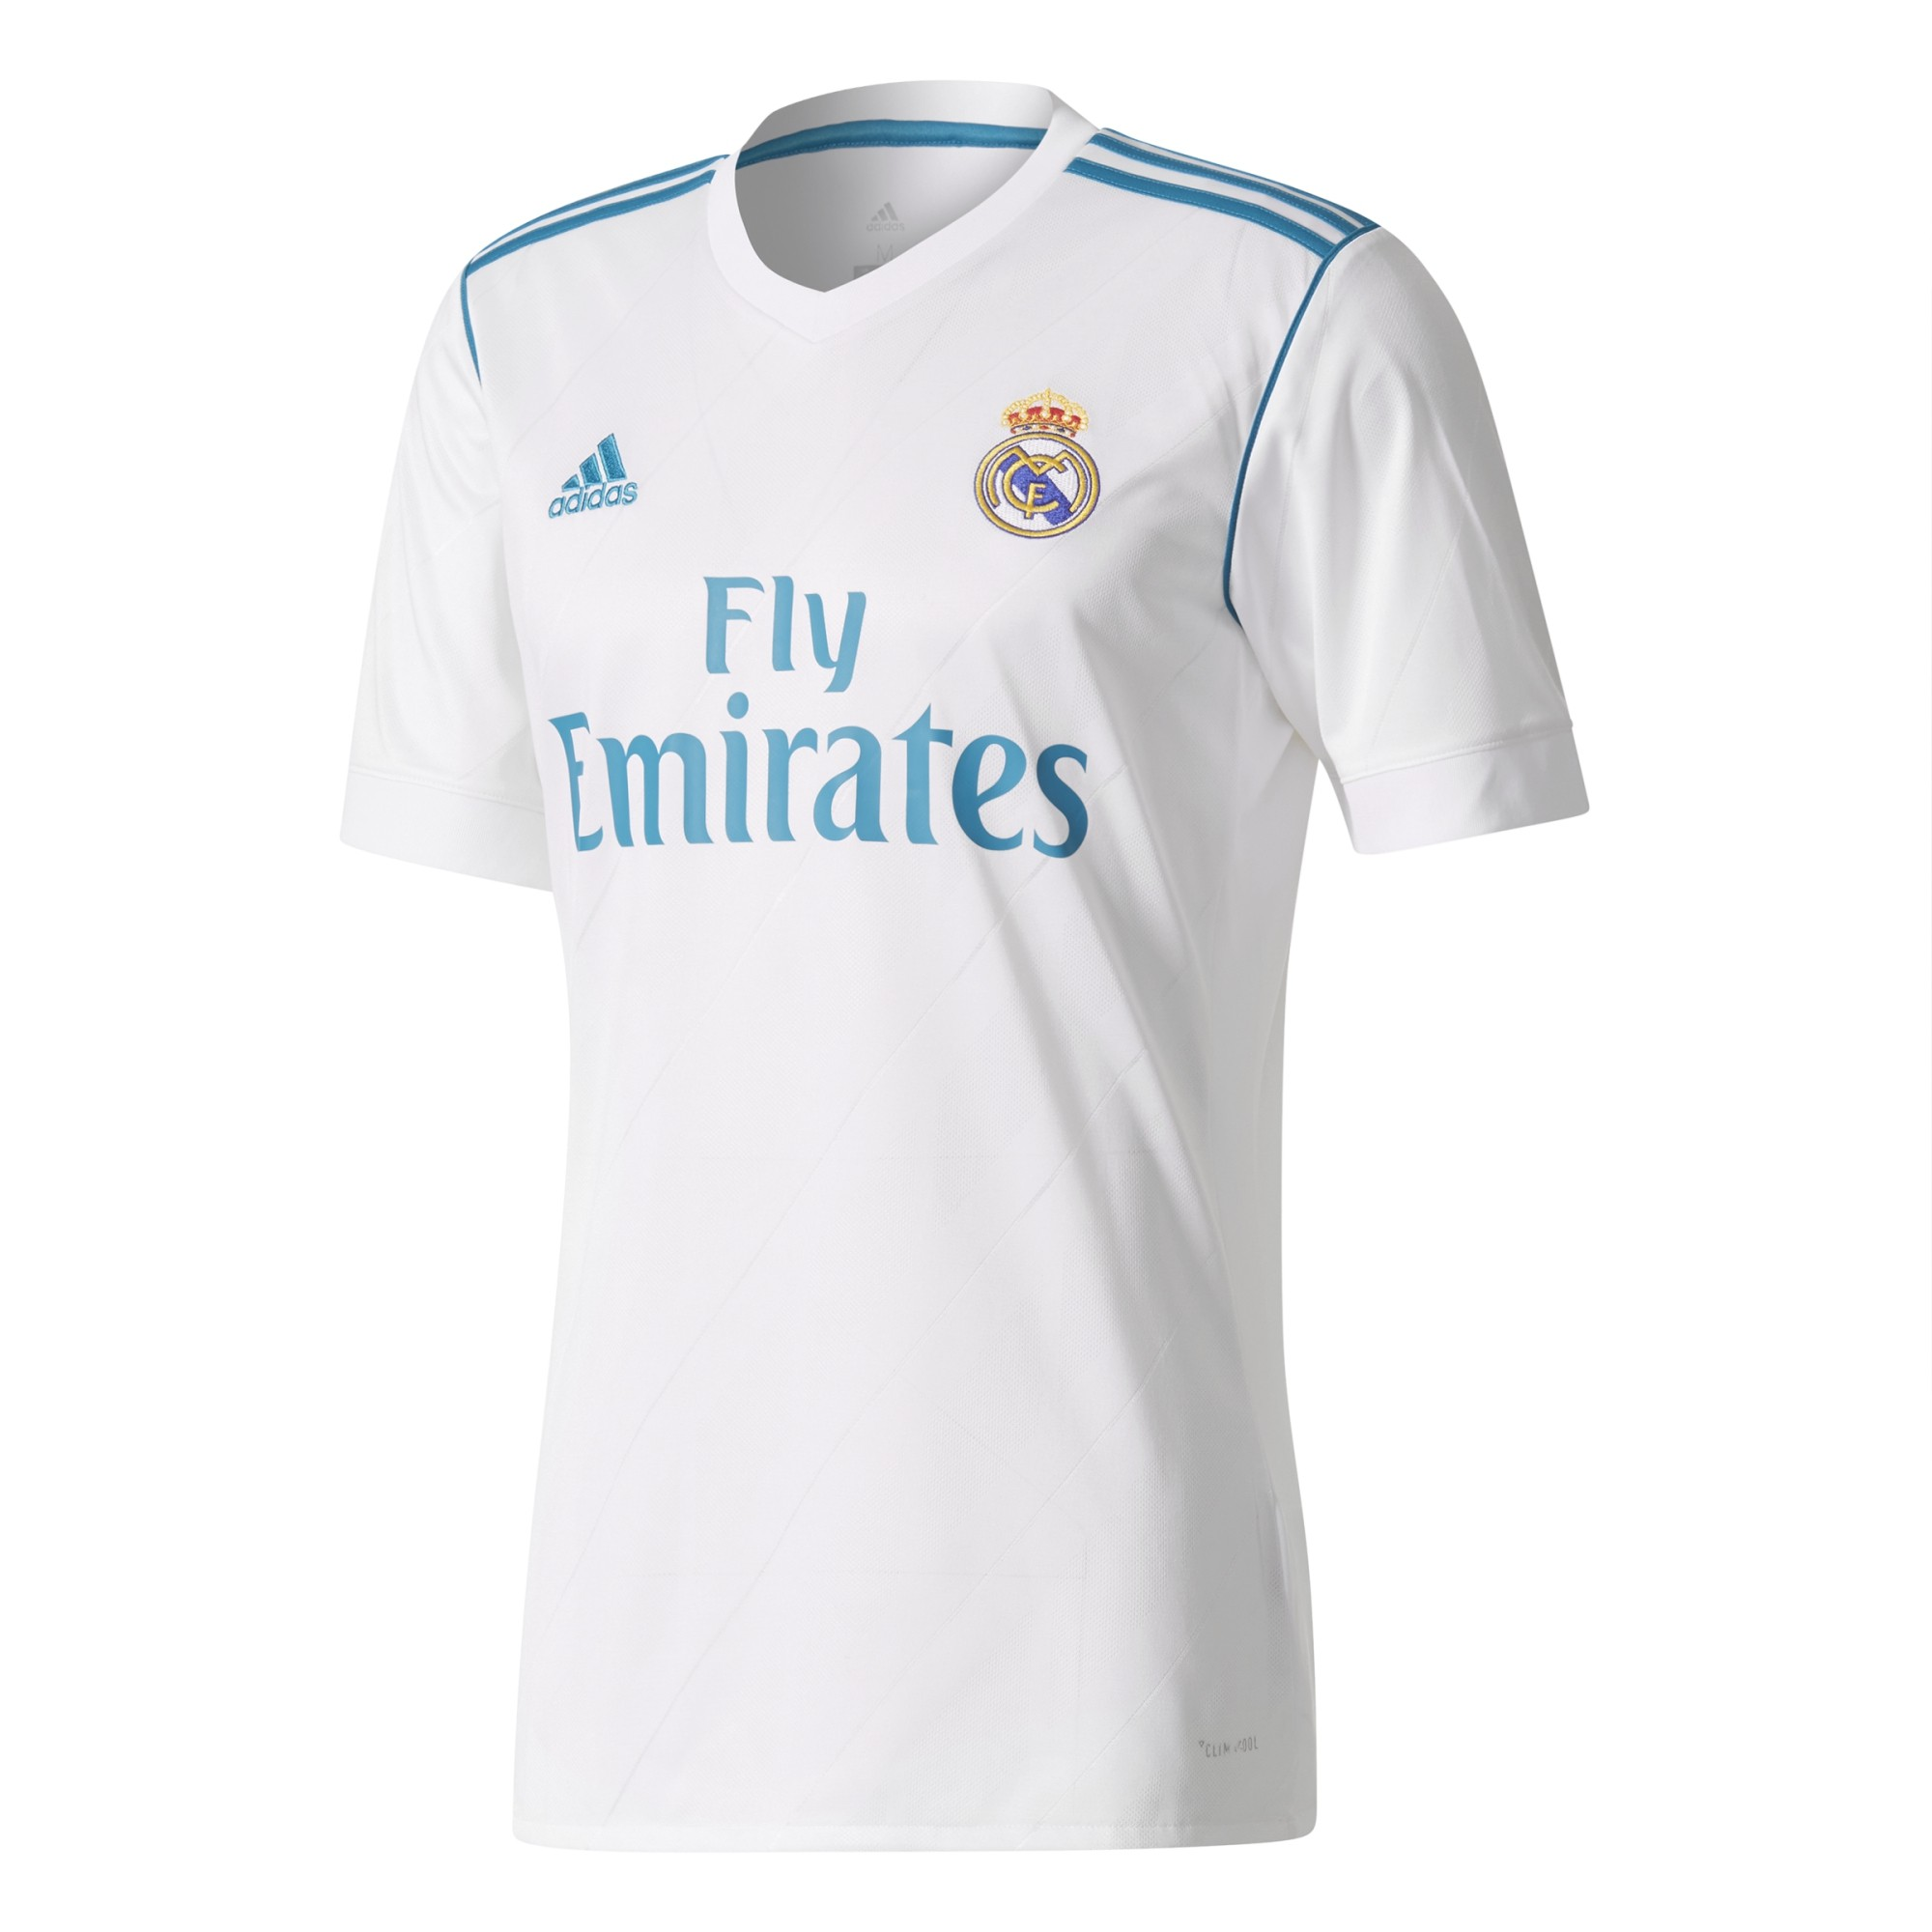 Camiseta Adidas Real Madrid Blanco Hombre - Deportes Moya e97a7456a95d0